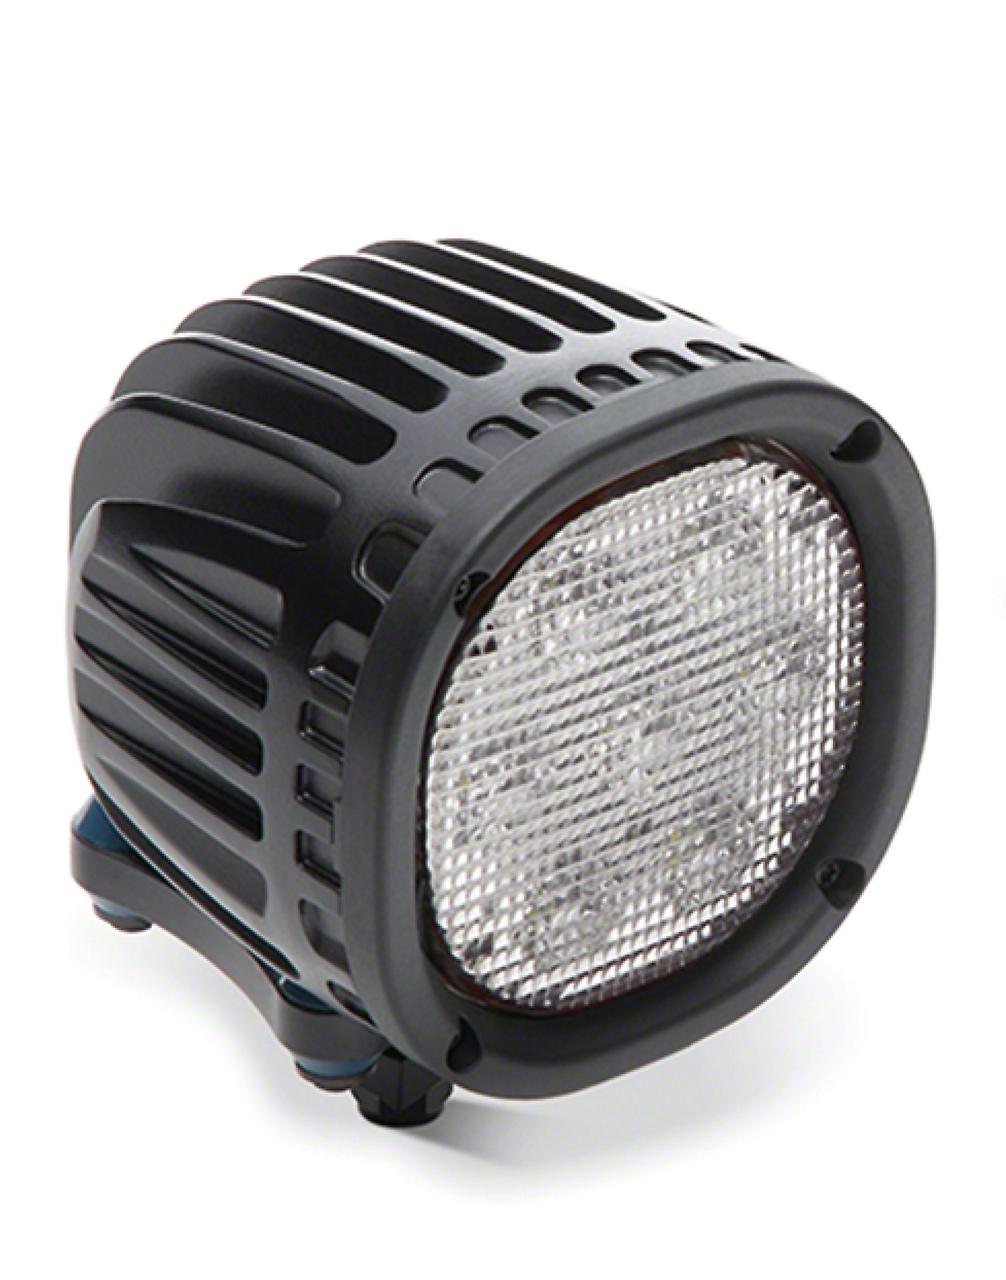 Mopar 7 in. Round LED Lights - Pair (2018 Jeep Wrangler JL)